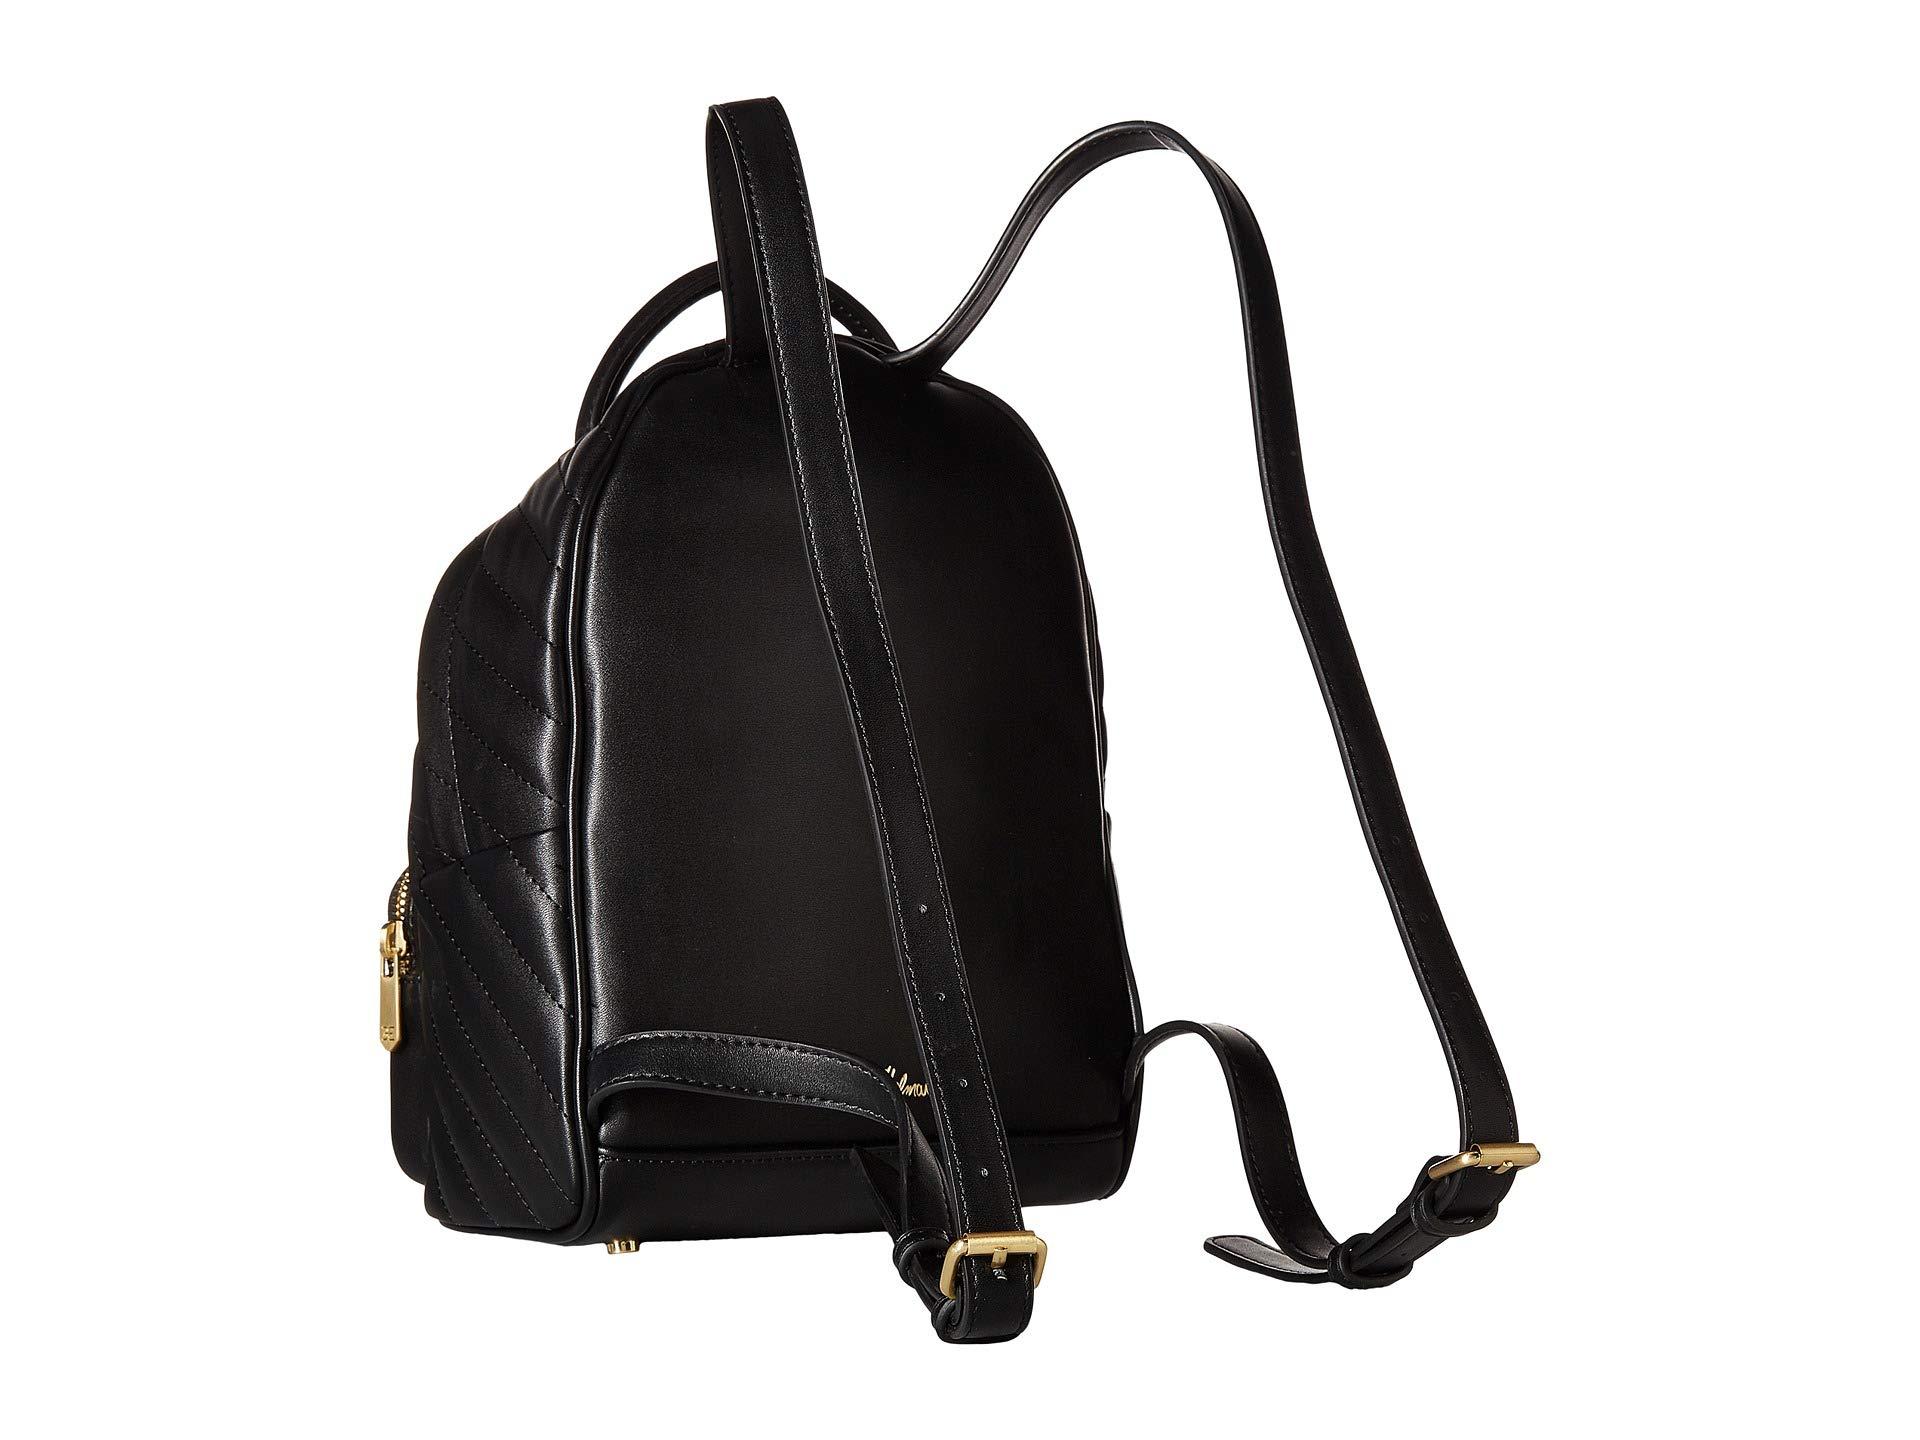 Keely Black Sam Backpack Sam Edelman Edelman qXgTtw